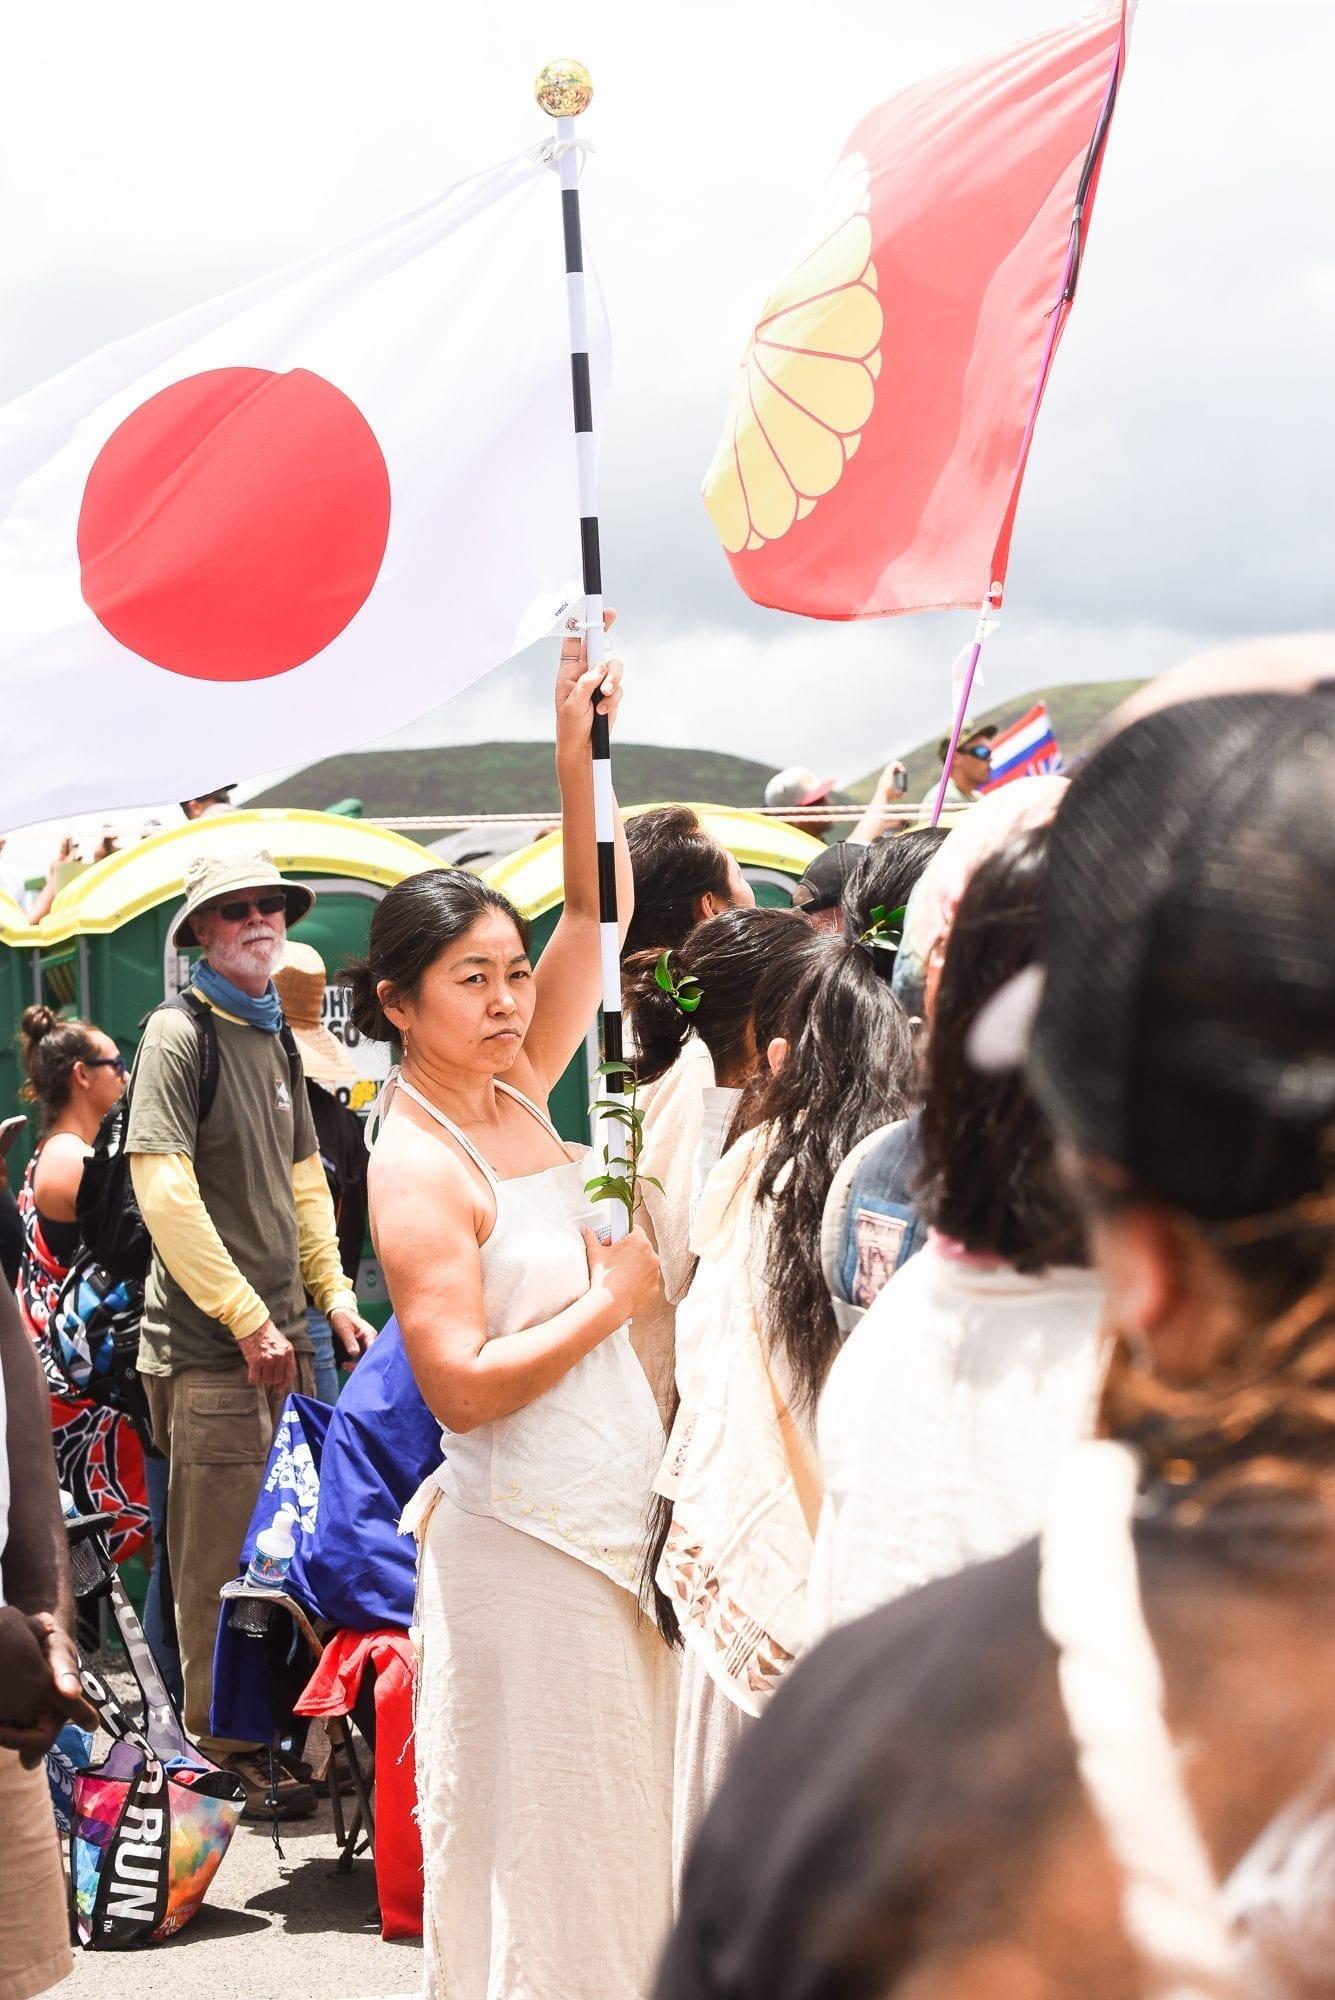 Japanese woman holding flag at Mauna Kea